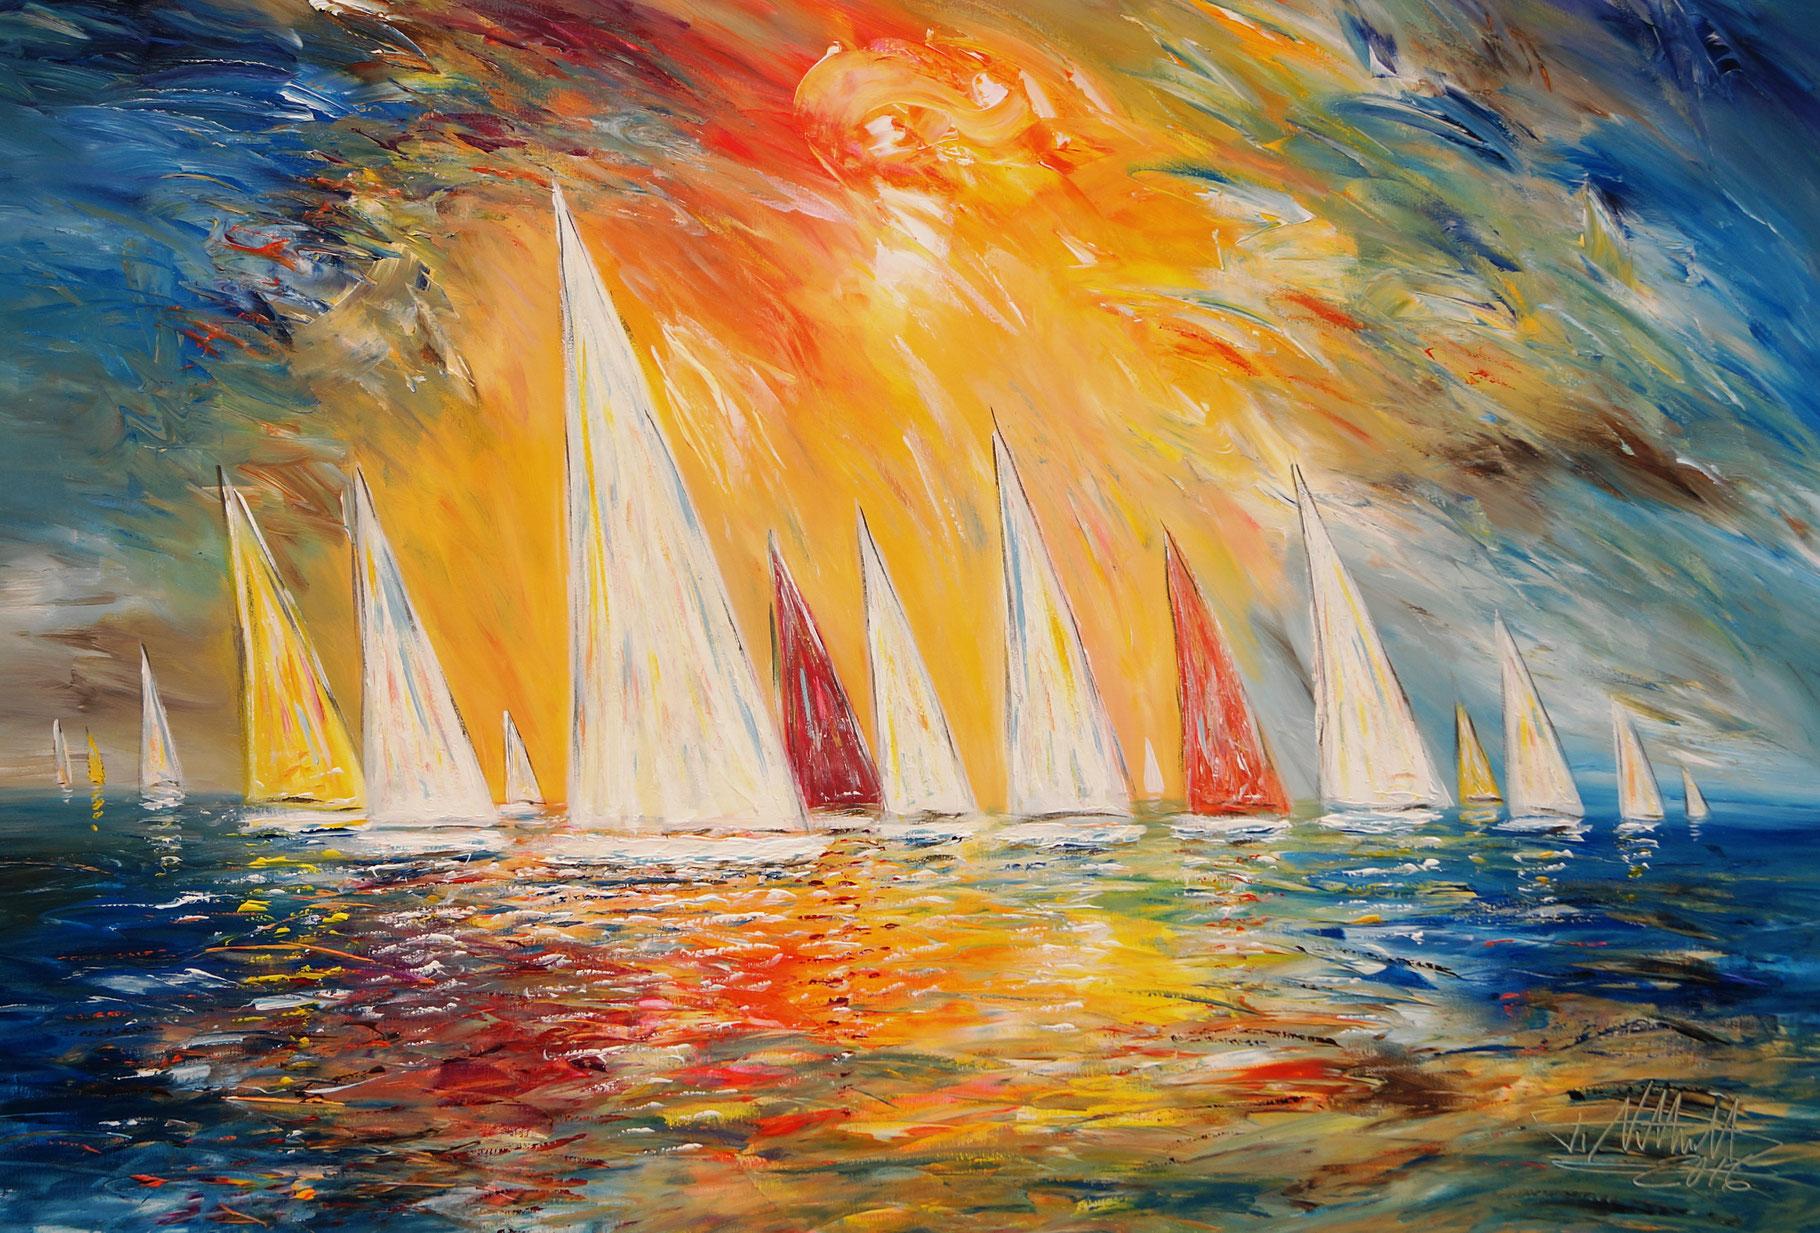 sunny sailing regatta m2 abstrakte gem lde moderne malerei online kaufen. Black Bedroom Furniture Sets. Home Design Ideas